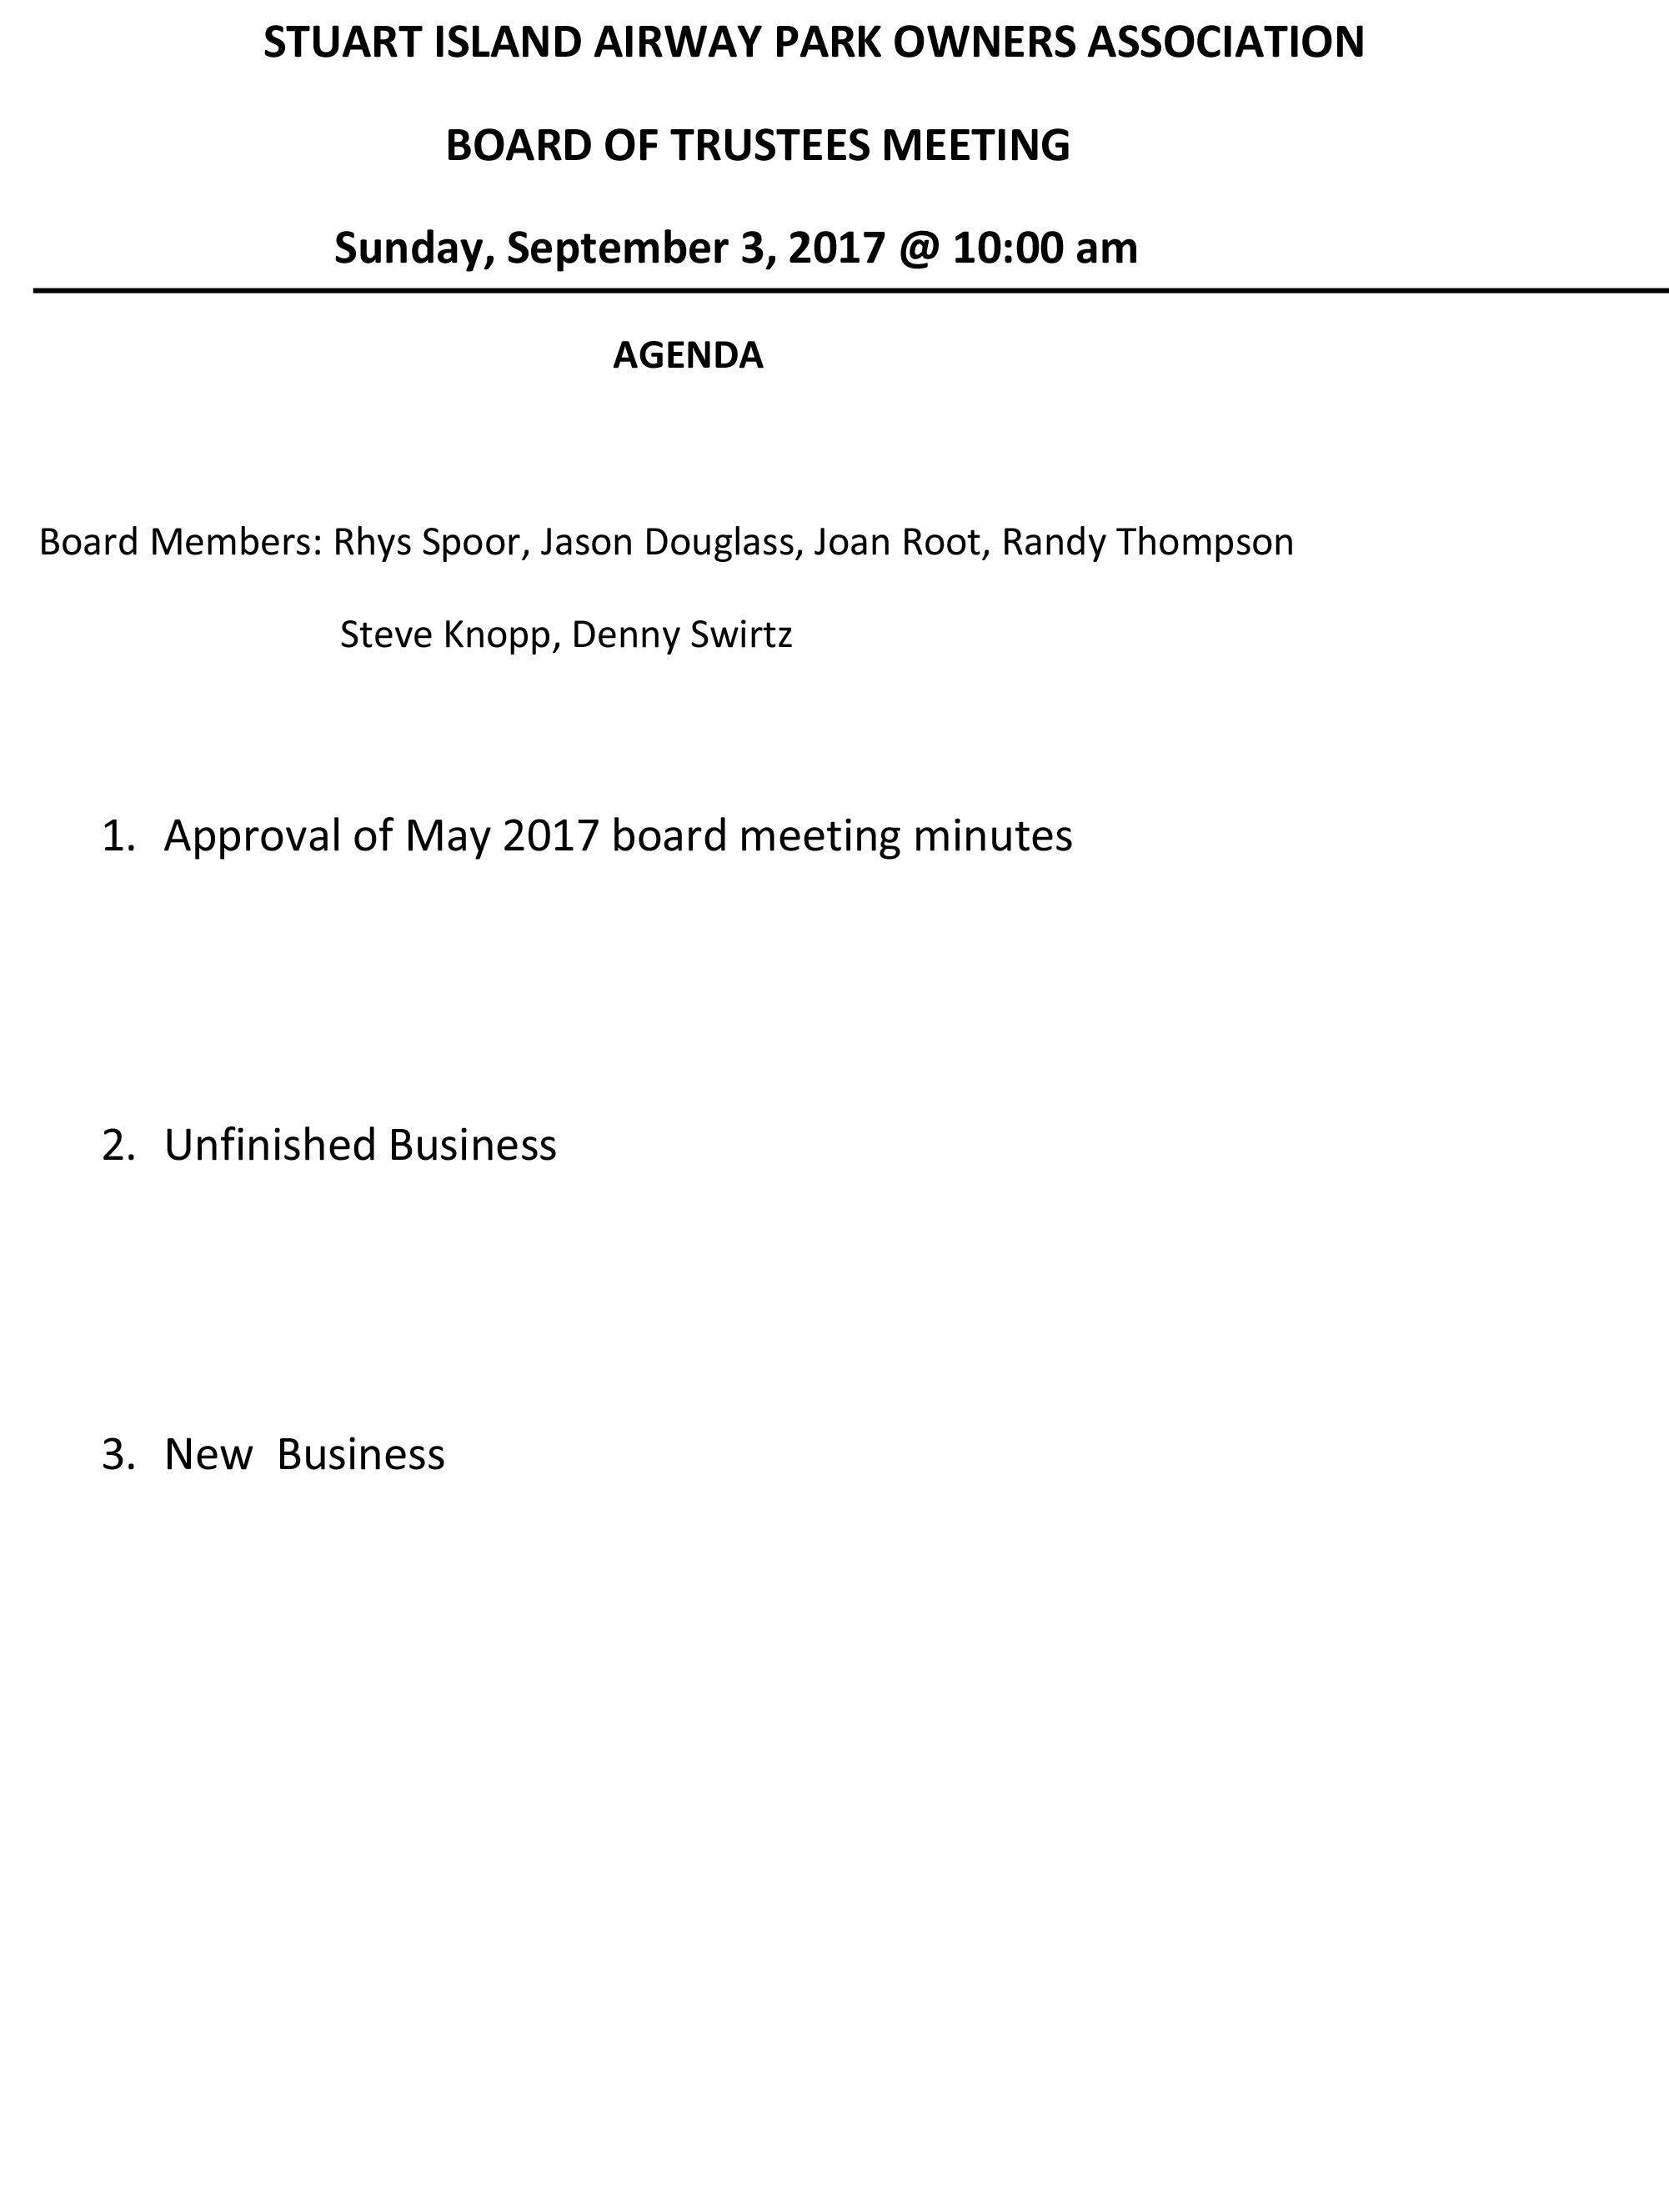 September Board Meeting Agenda – Board Meeting Agenda